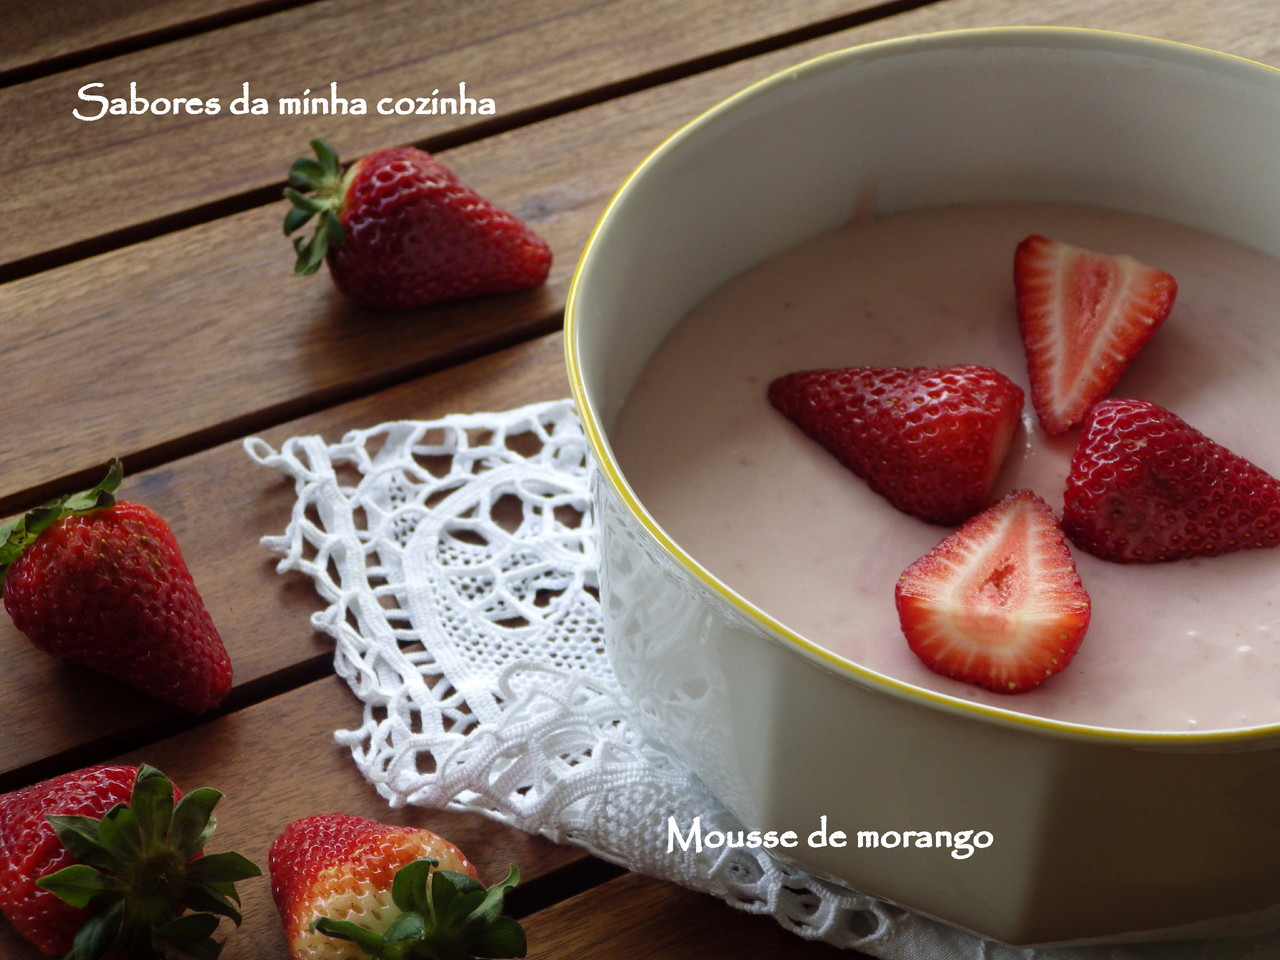 IMGP4622-mousse de morango-Blog.JPG